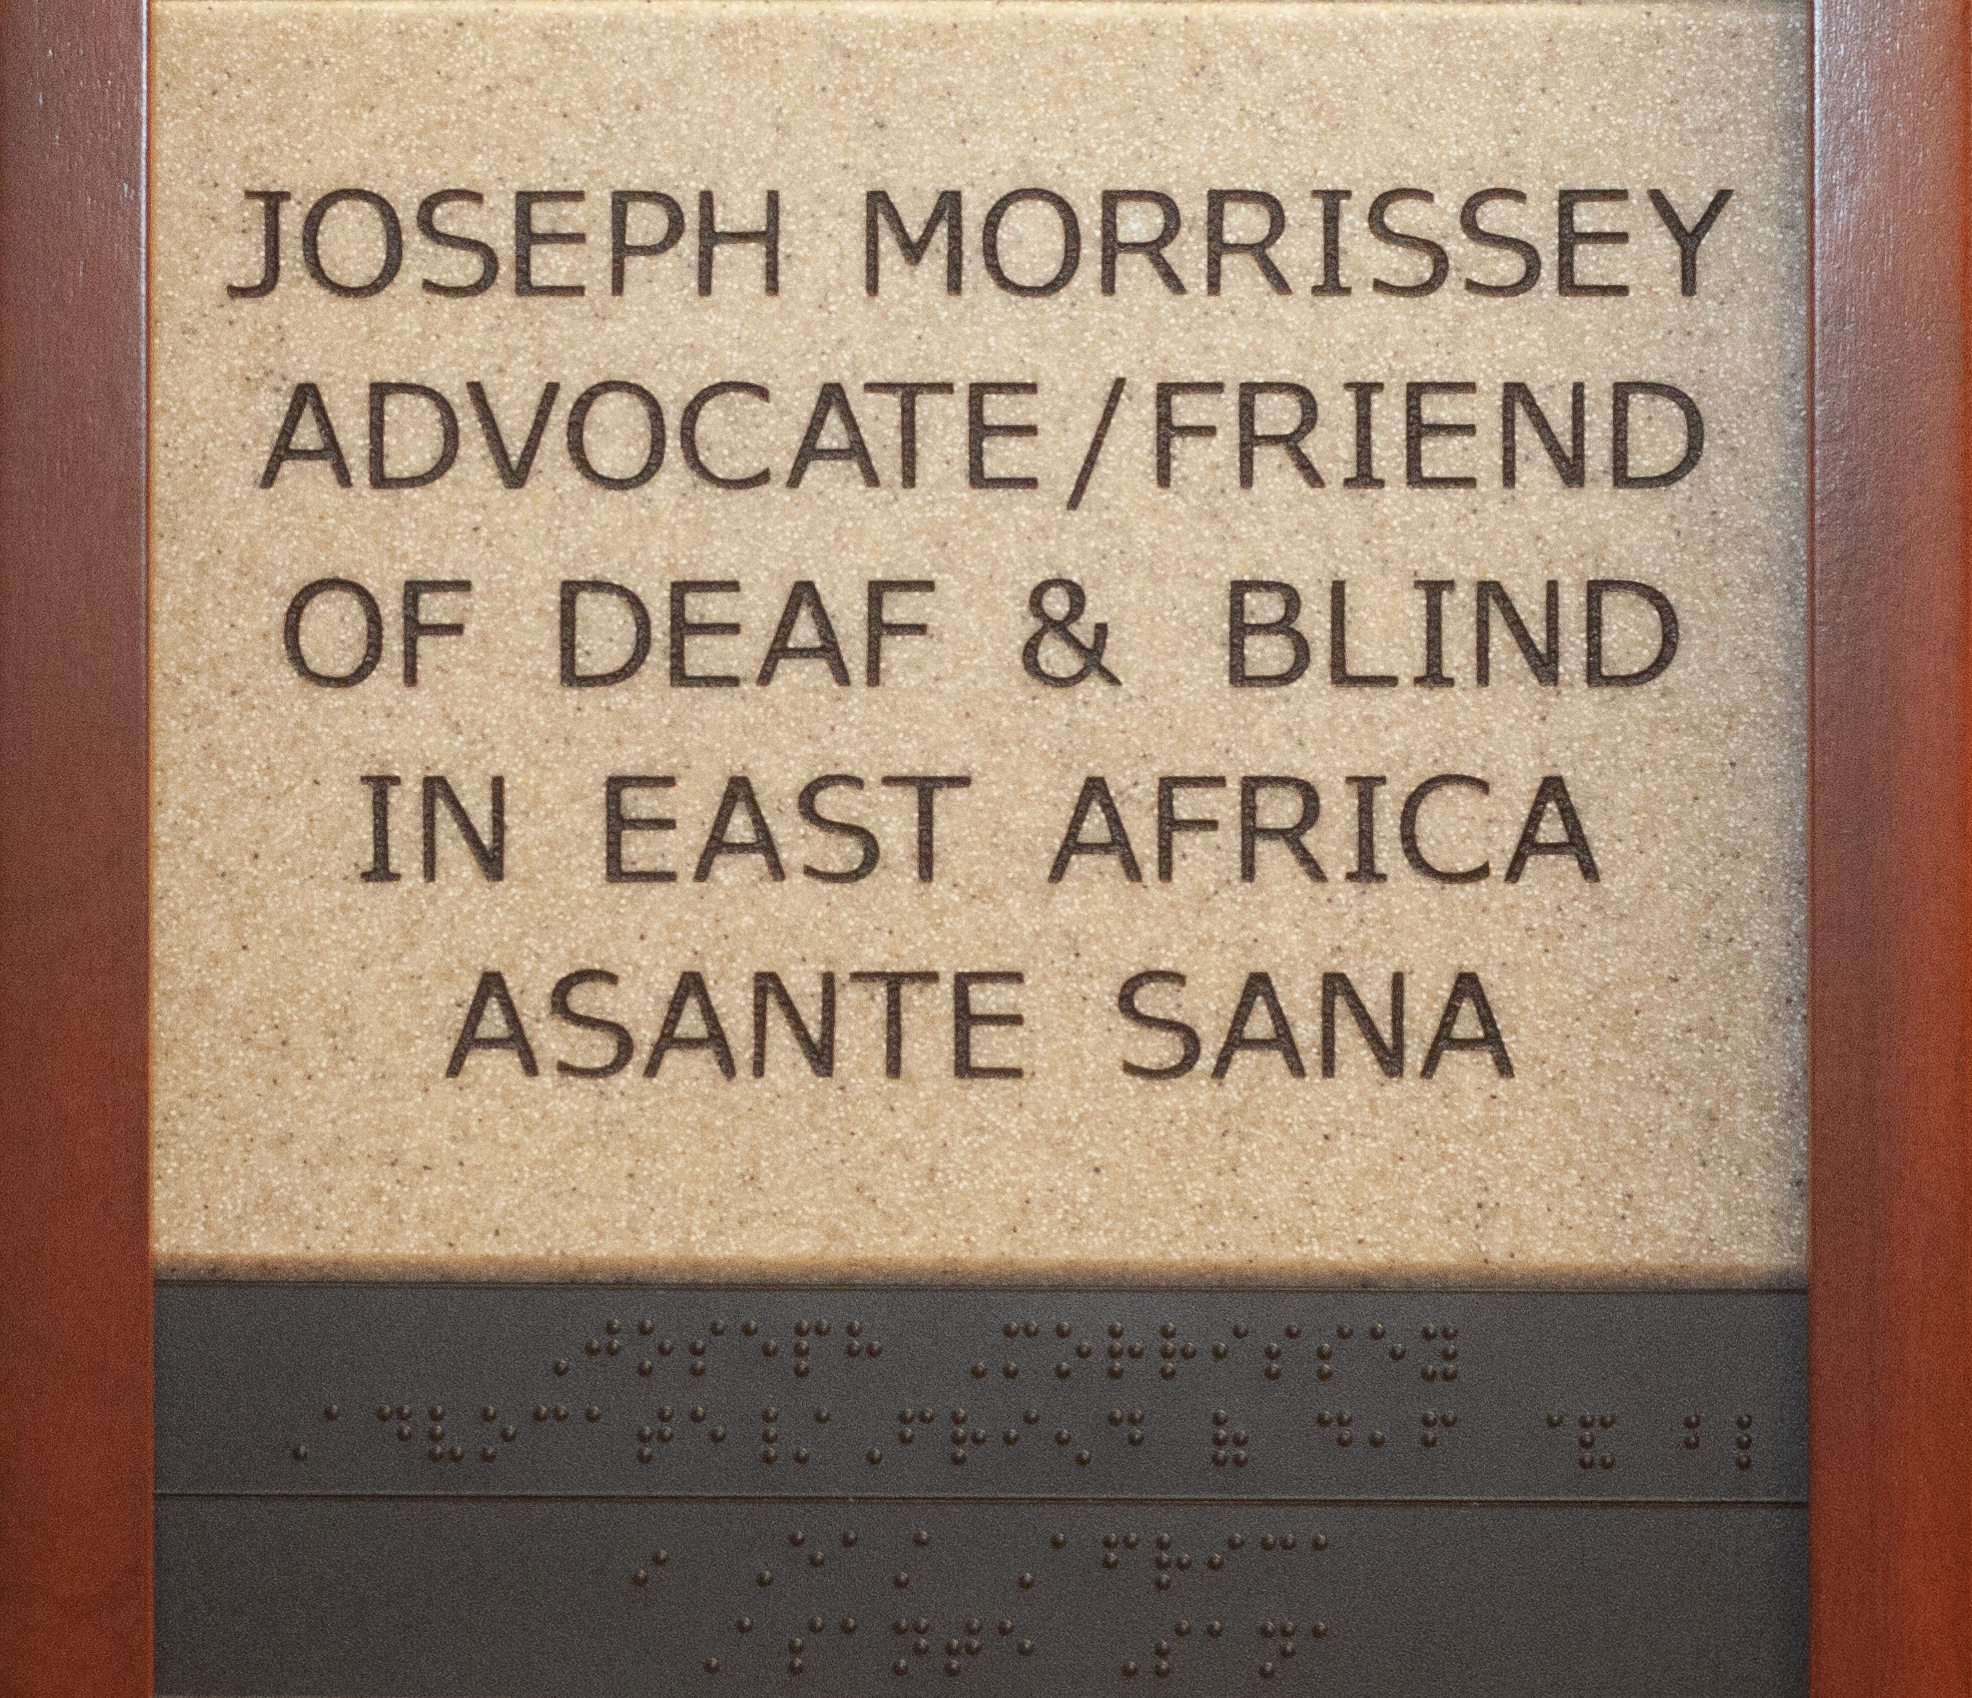 Joseph Morrissey Advocate/Friend of Deaf and Blind in East Africa Asante Sana